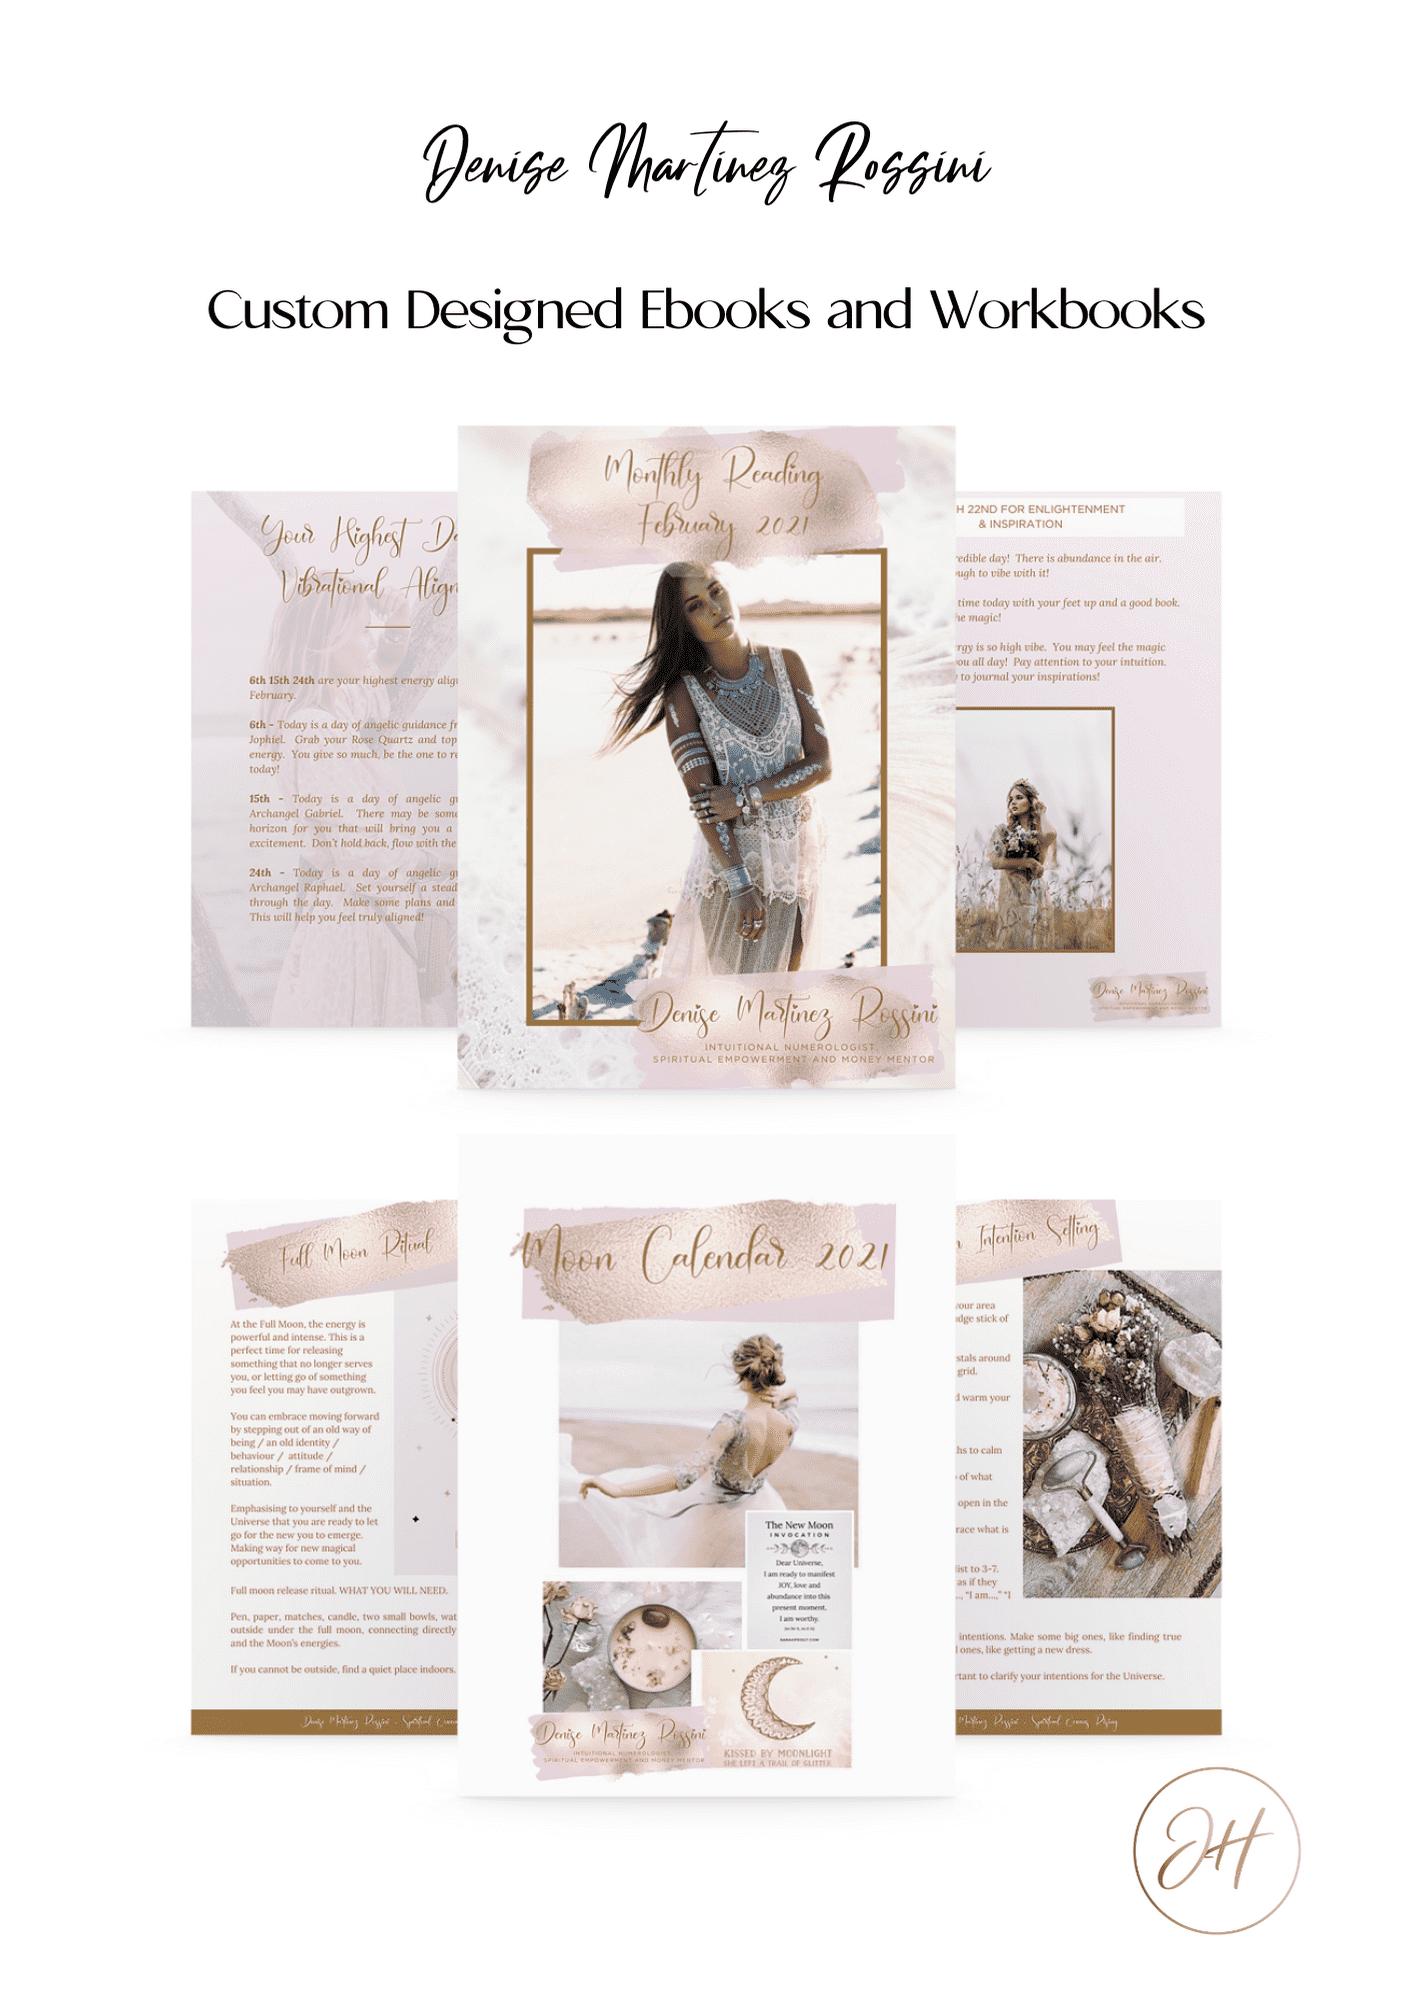 portfolio-jo-hewson-denise-martinez-rossini-ebooks